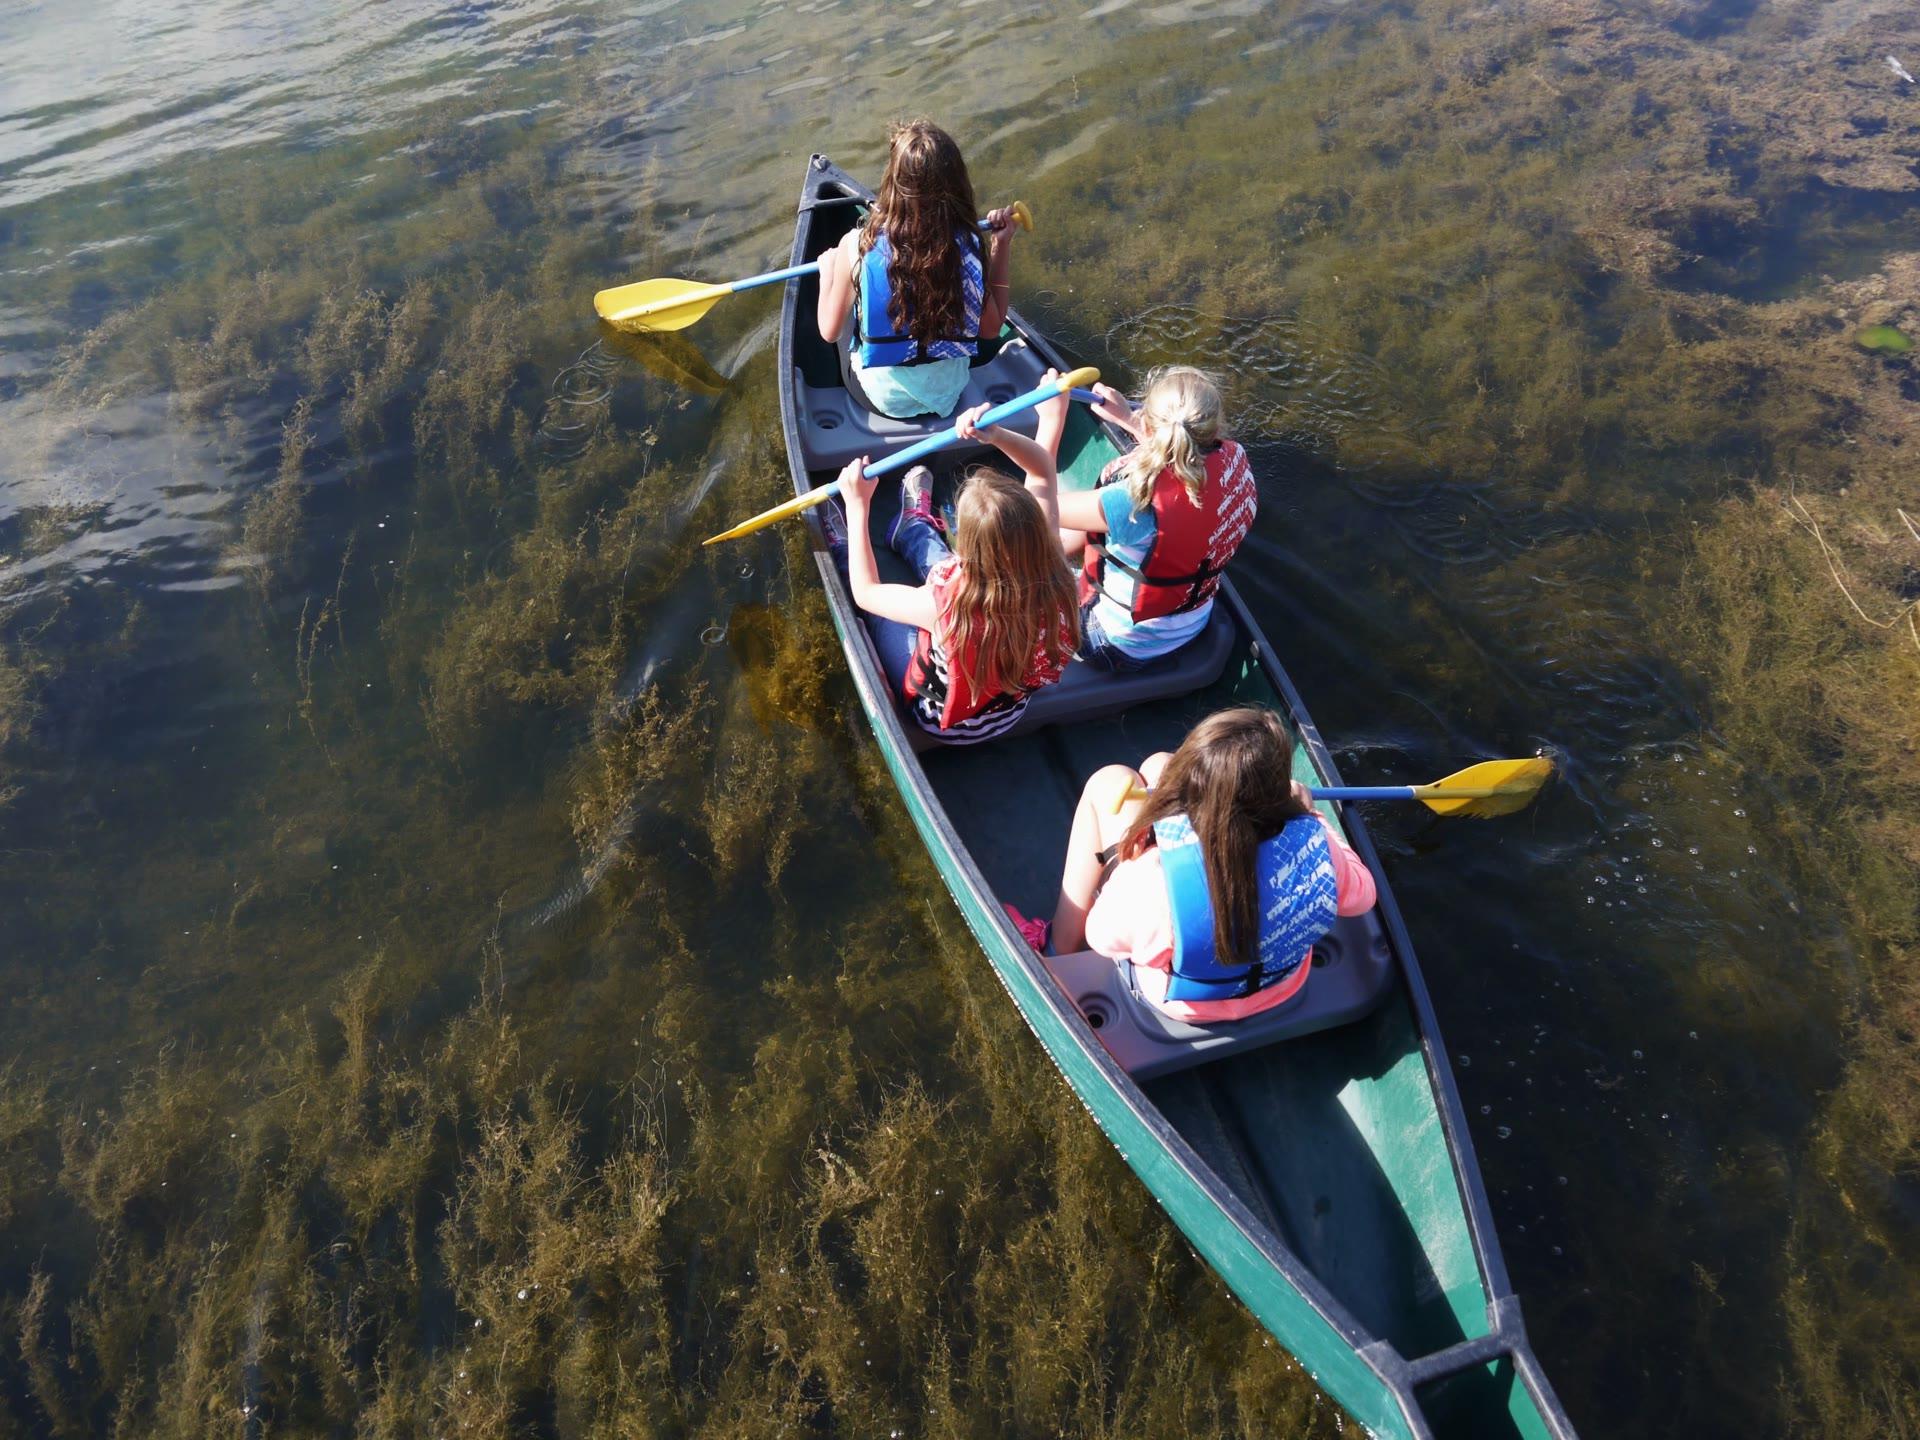 Four children in a canoe